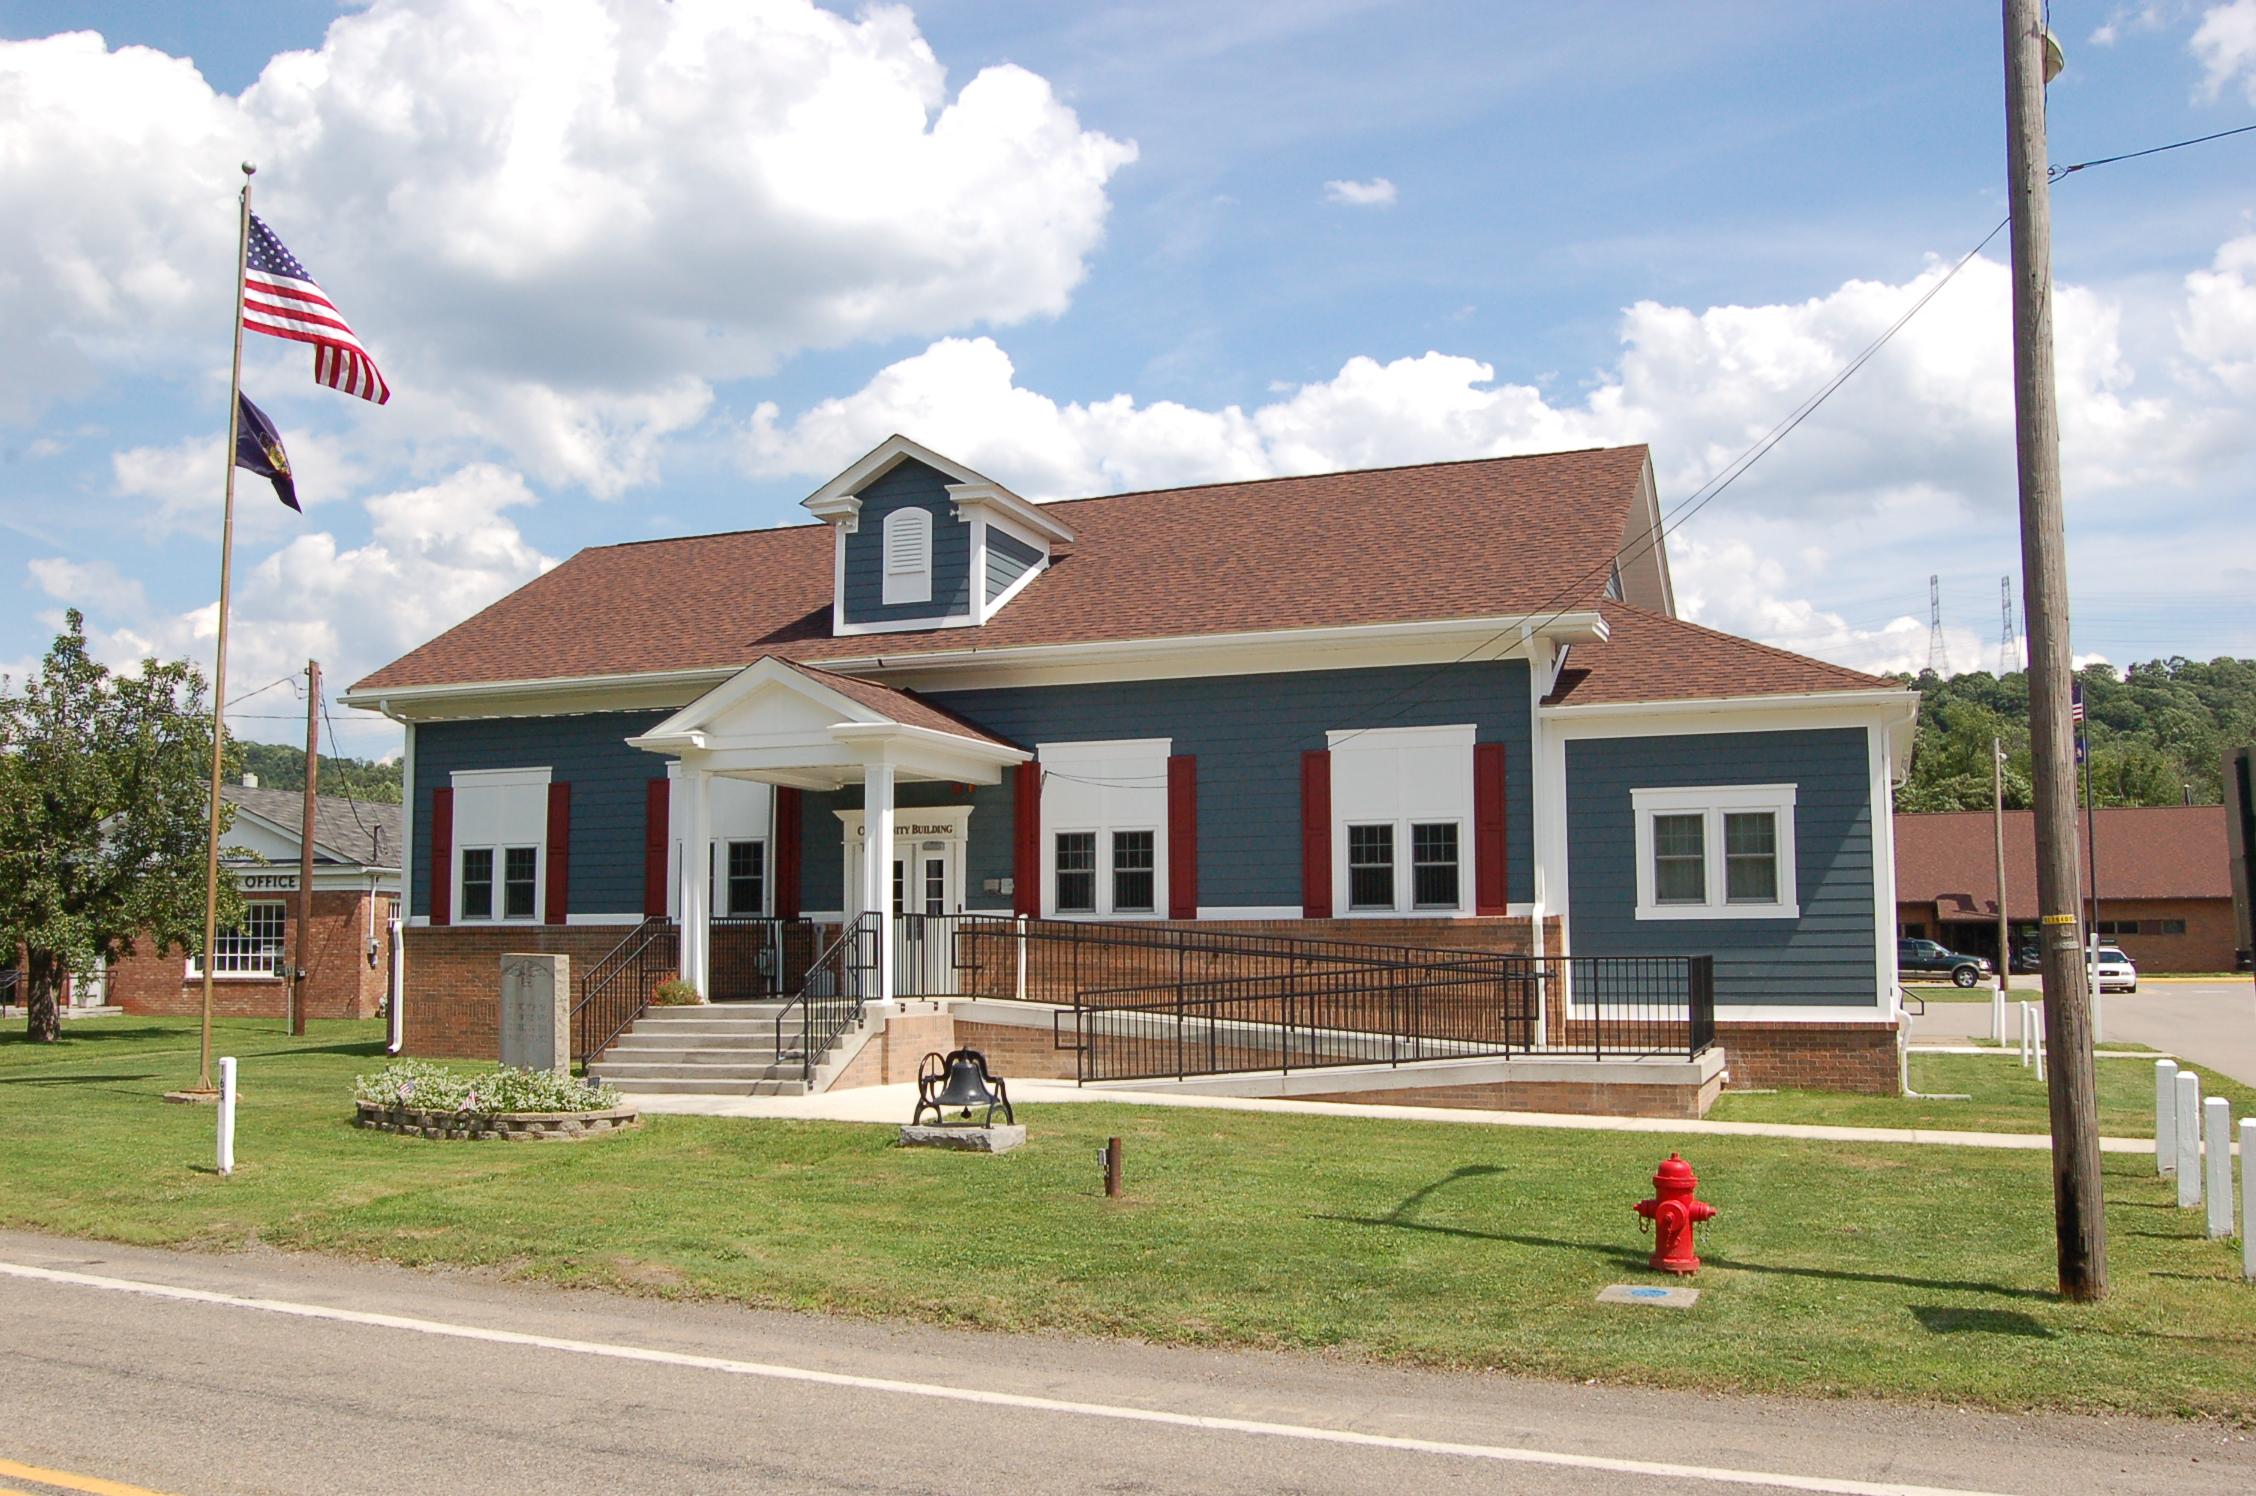 Borough of Shippingport Community Building, Shippingport, PA